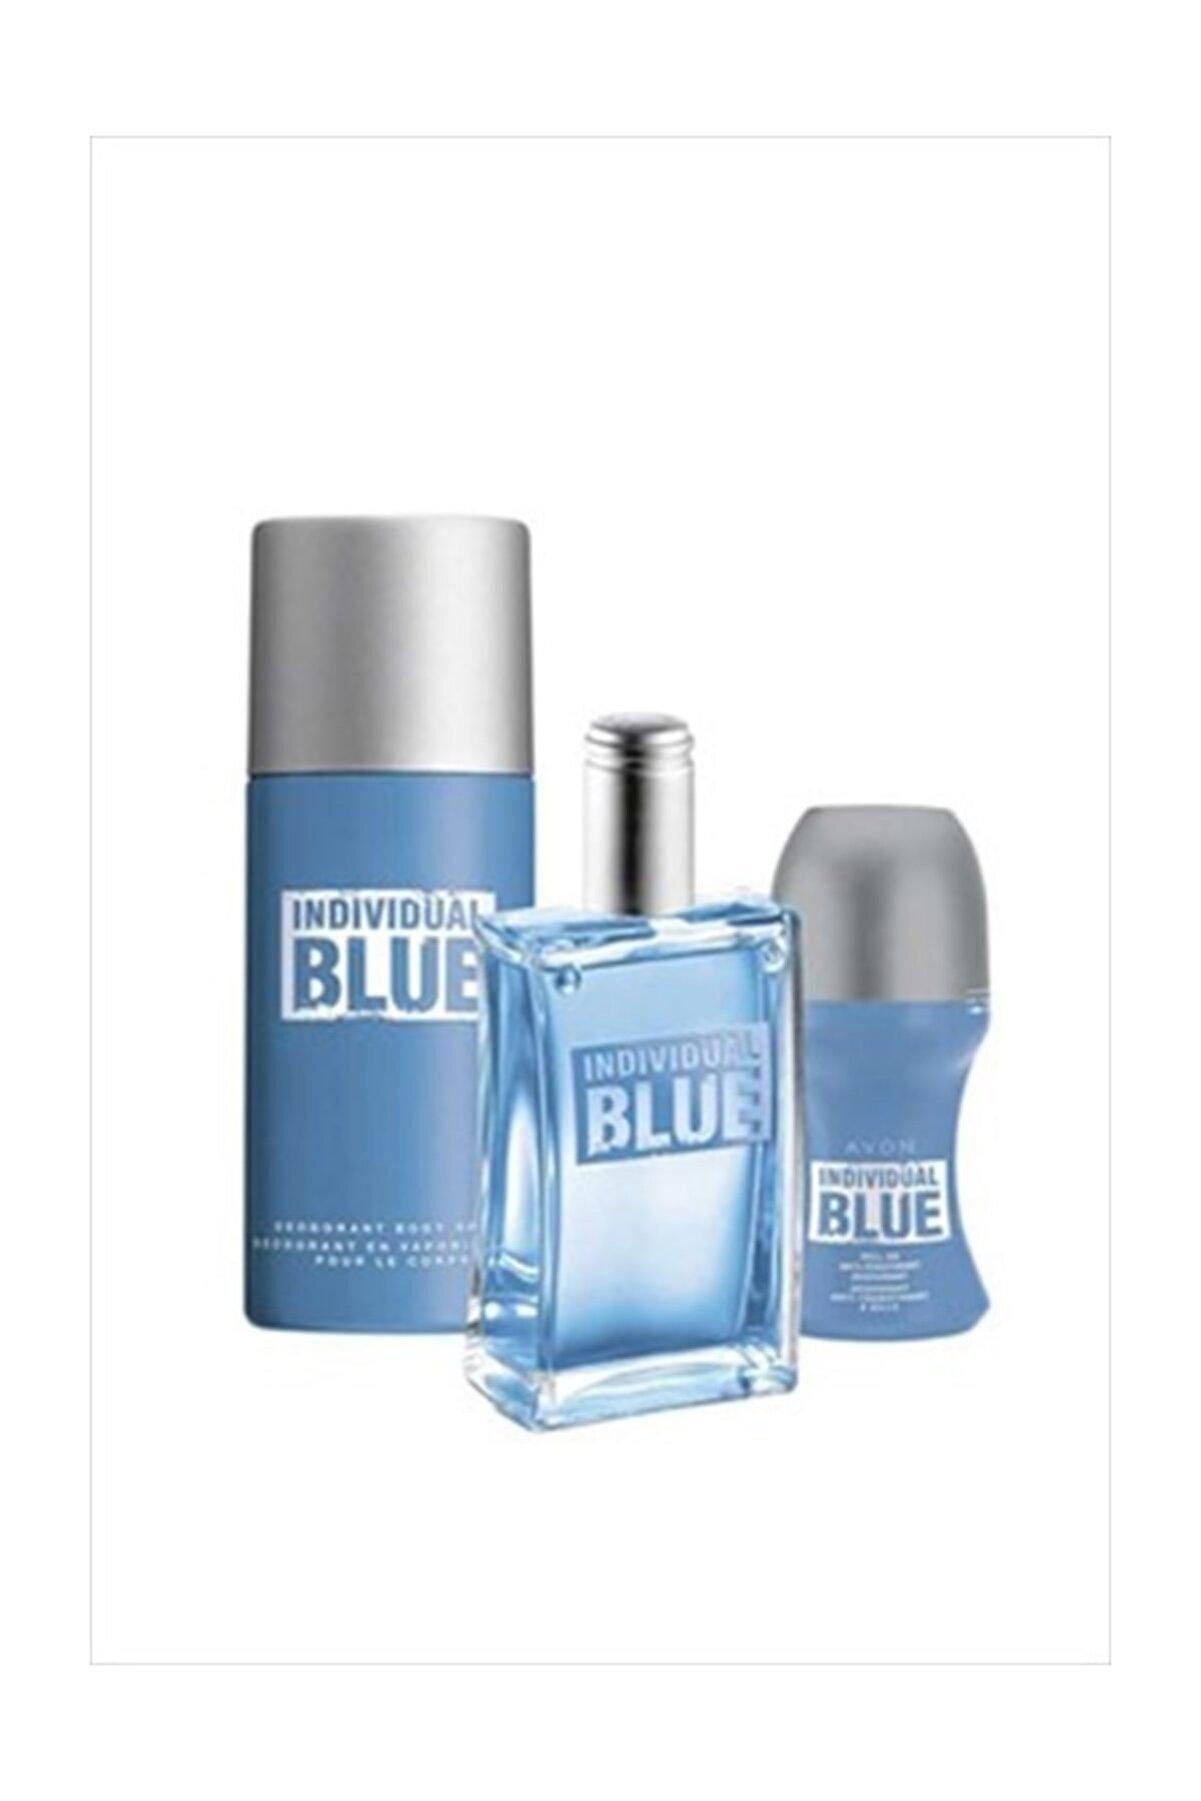 Avon Individual Blue Edt Erkek Parfüm Seti 8681298980902 200 ml